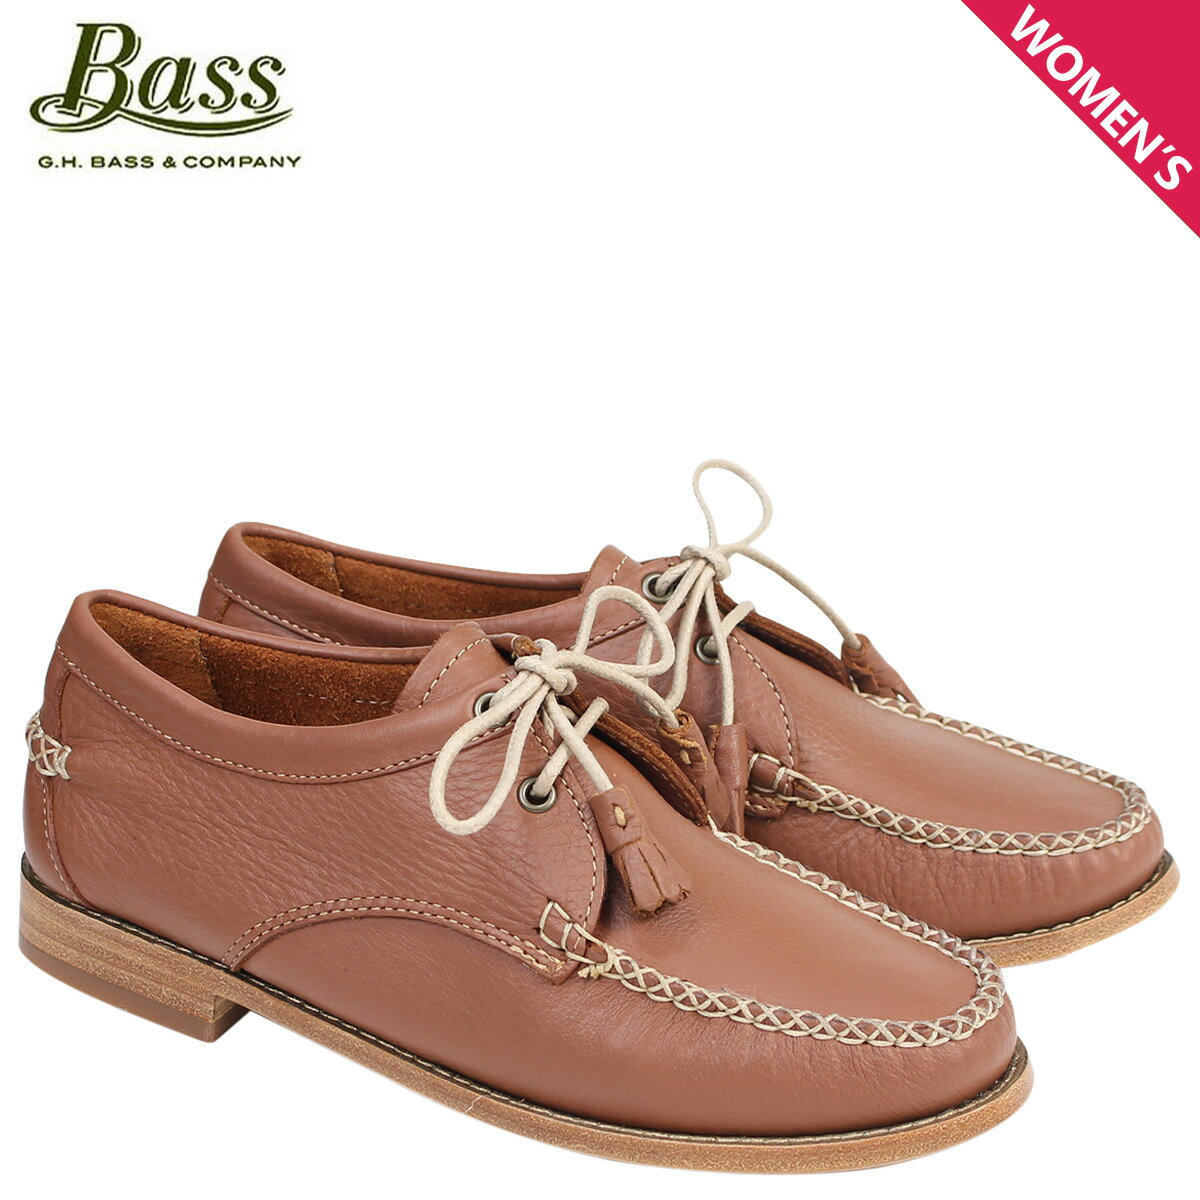 G.H. BASS ローファー ジーエイチバス レディース タッセル WINNIE TIE WEEJUNS 71-22872 靴 ブラウン